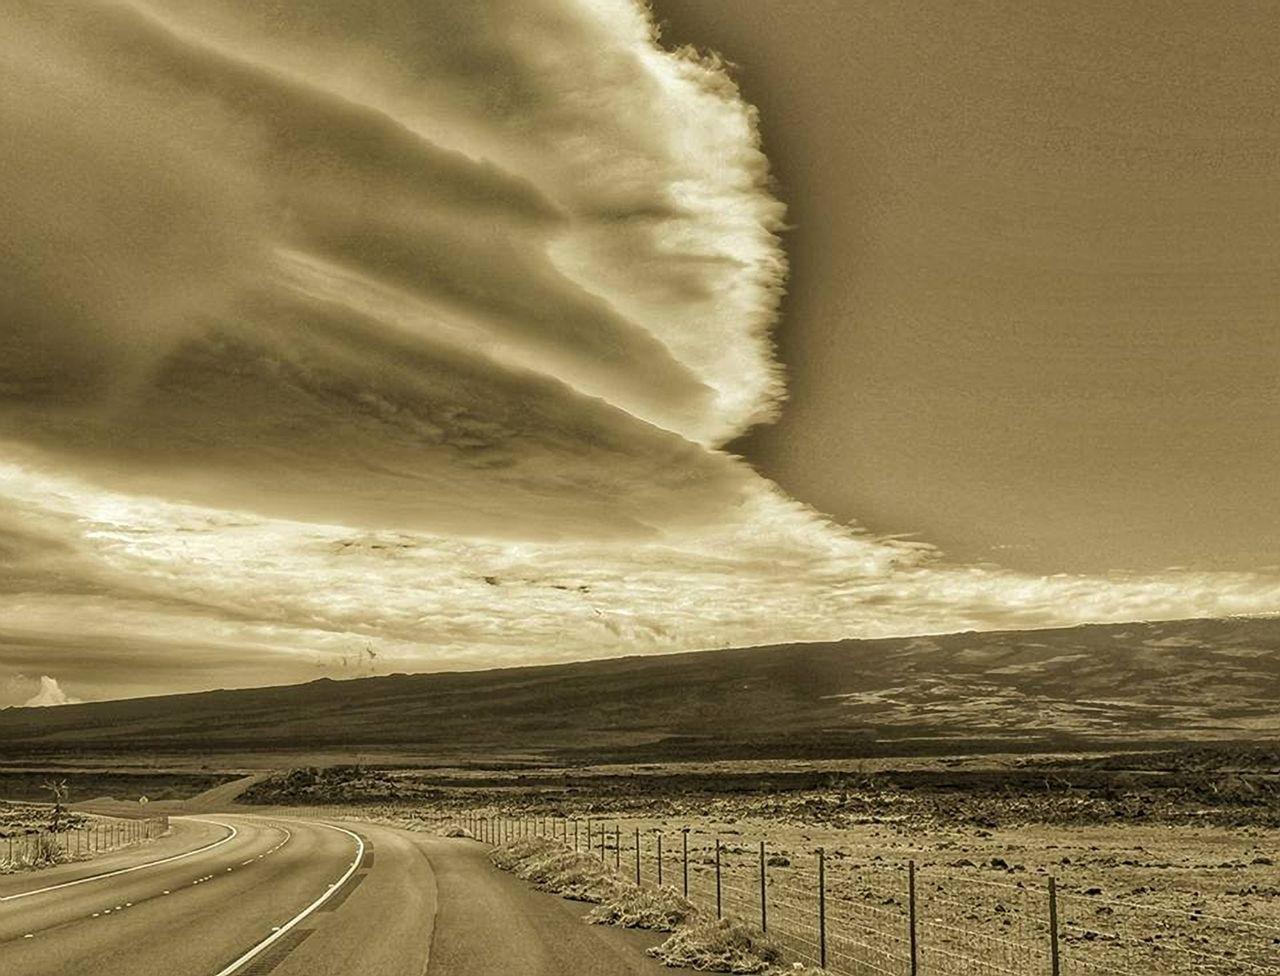 Beauty In Nature Cloud Cloud - Sky Cloudy Diminishing Perspective Hawaii HAWAII Island Landscape Mauna Loa Mountain Nature Outdoors Remote Road Road Marking Saddle Road Scenics Sky Transportation Upland Hawaii Volcanic Landscape Weather